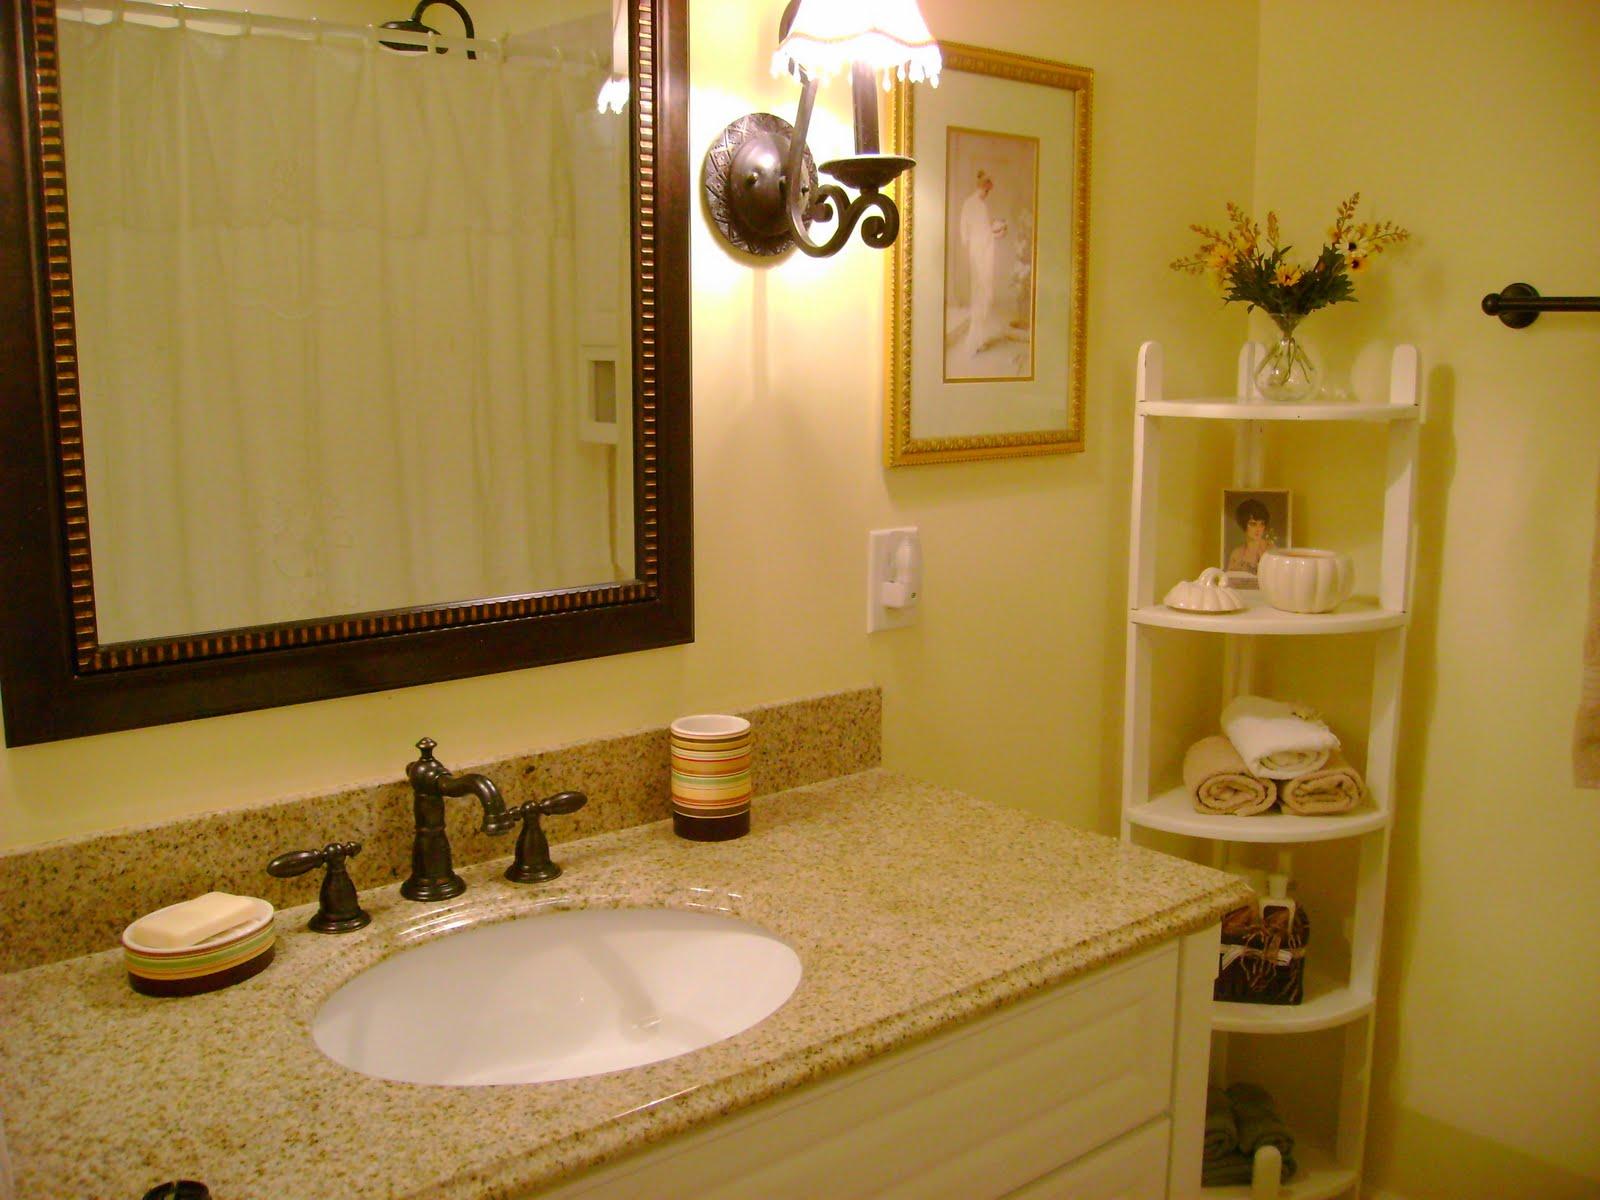 Bathroom Floor Tiles Granite : Cool granite bathroom floor tiles ideas and pictures